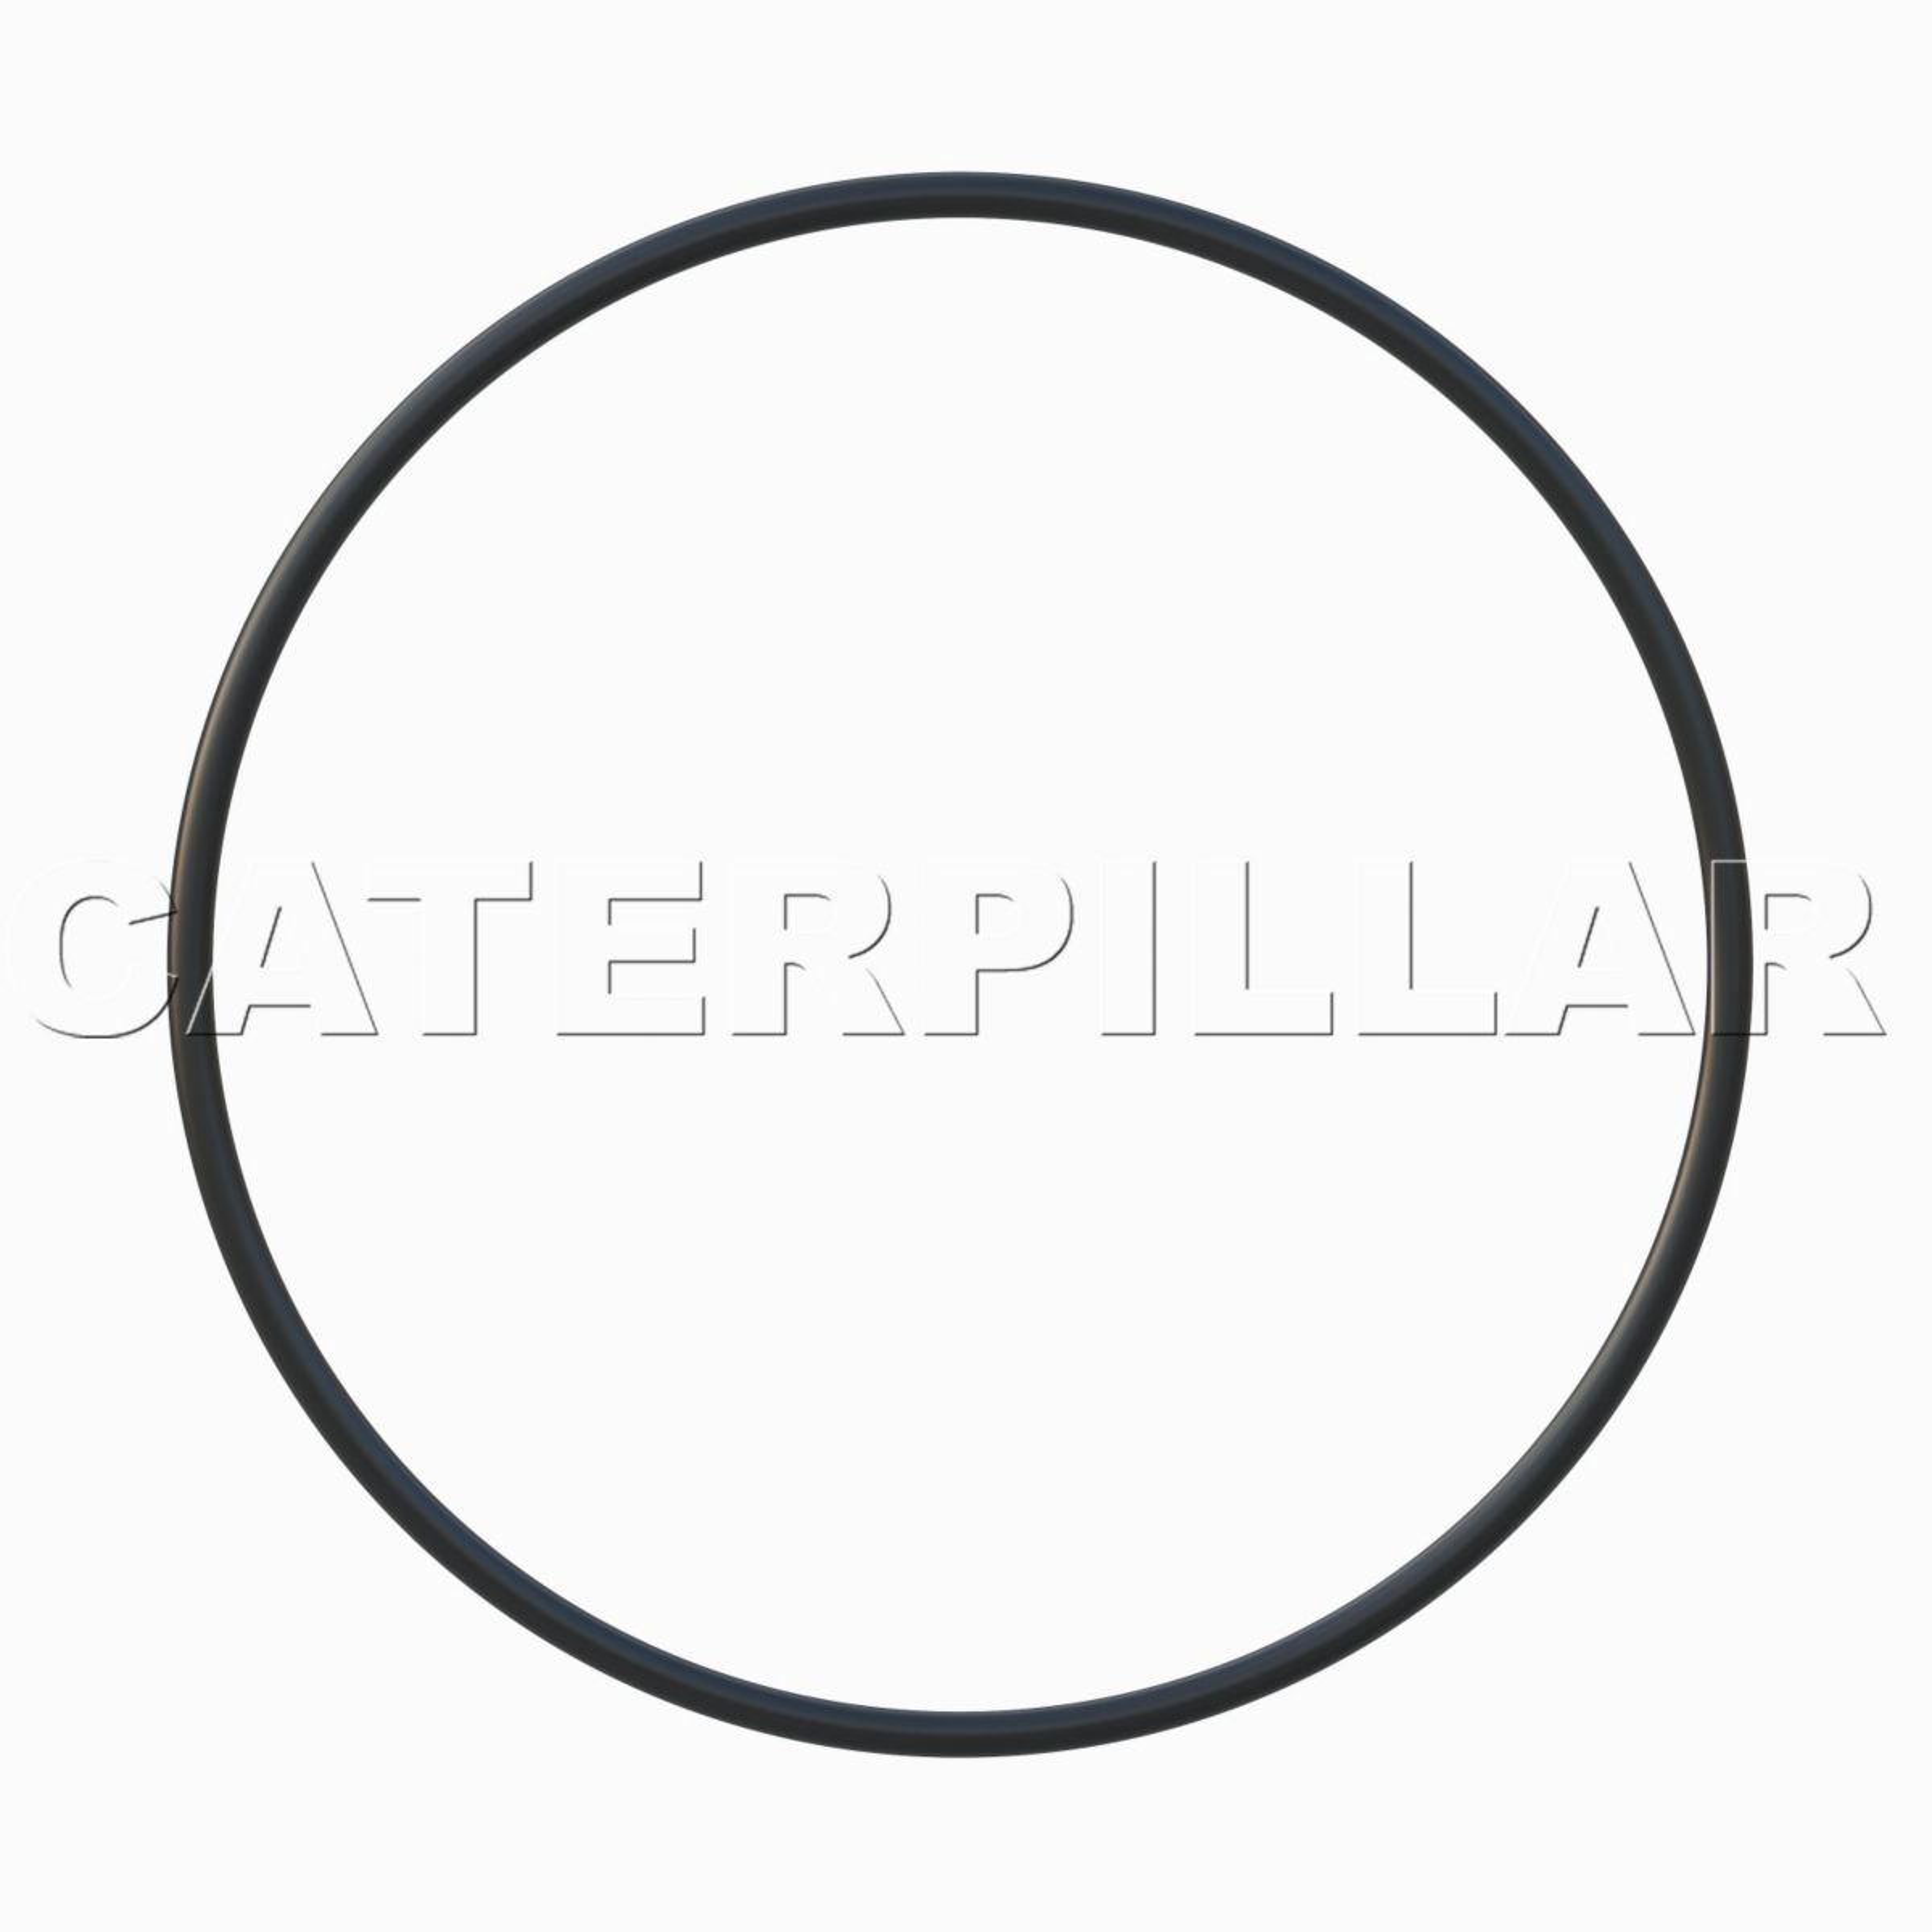 70A O-Ring 142,00x3,00 mm NBR 70A Innen /Ø:142,00mm Schnur/Ø:3,00mm Werkstoff:NBR